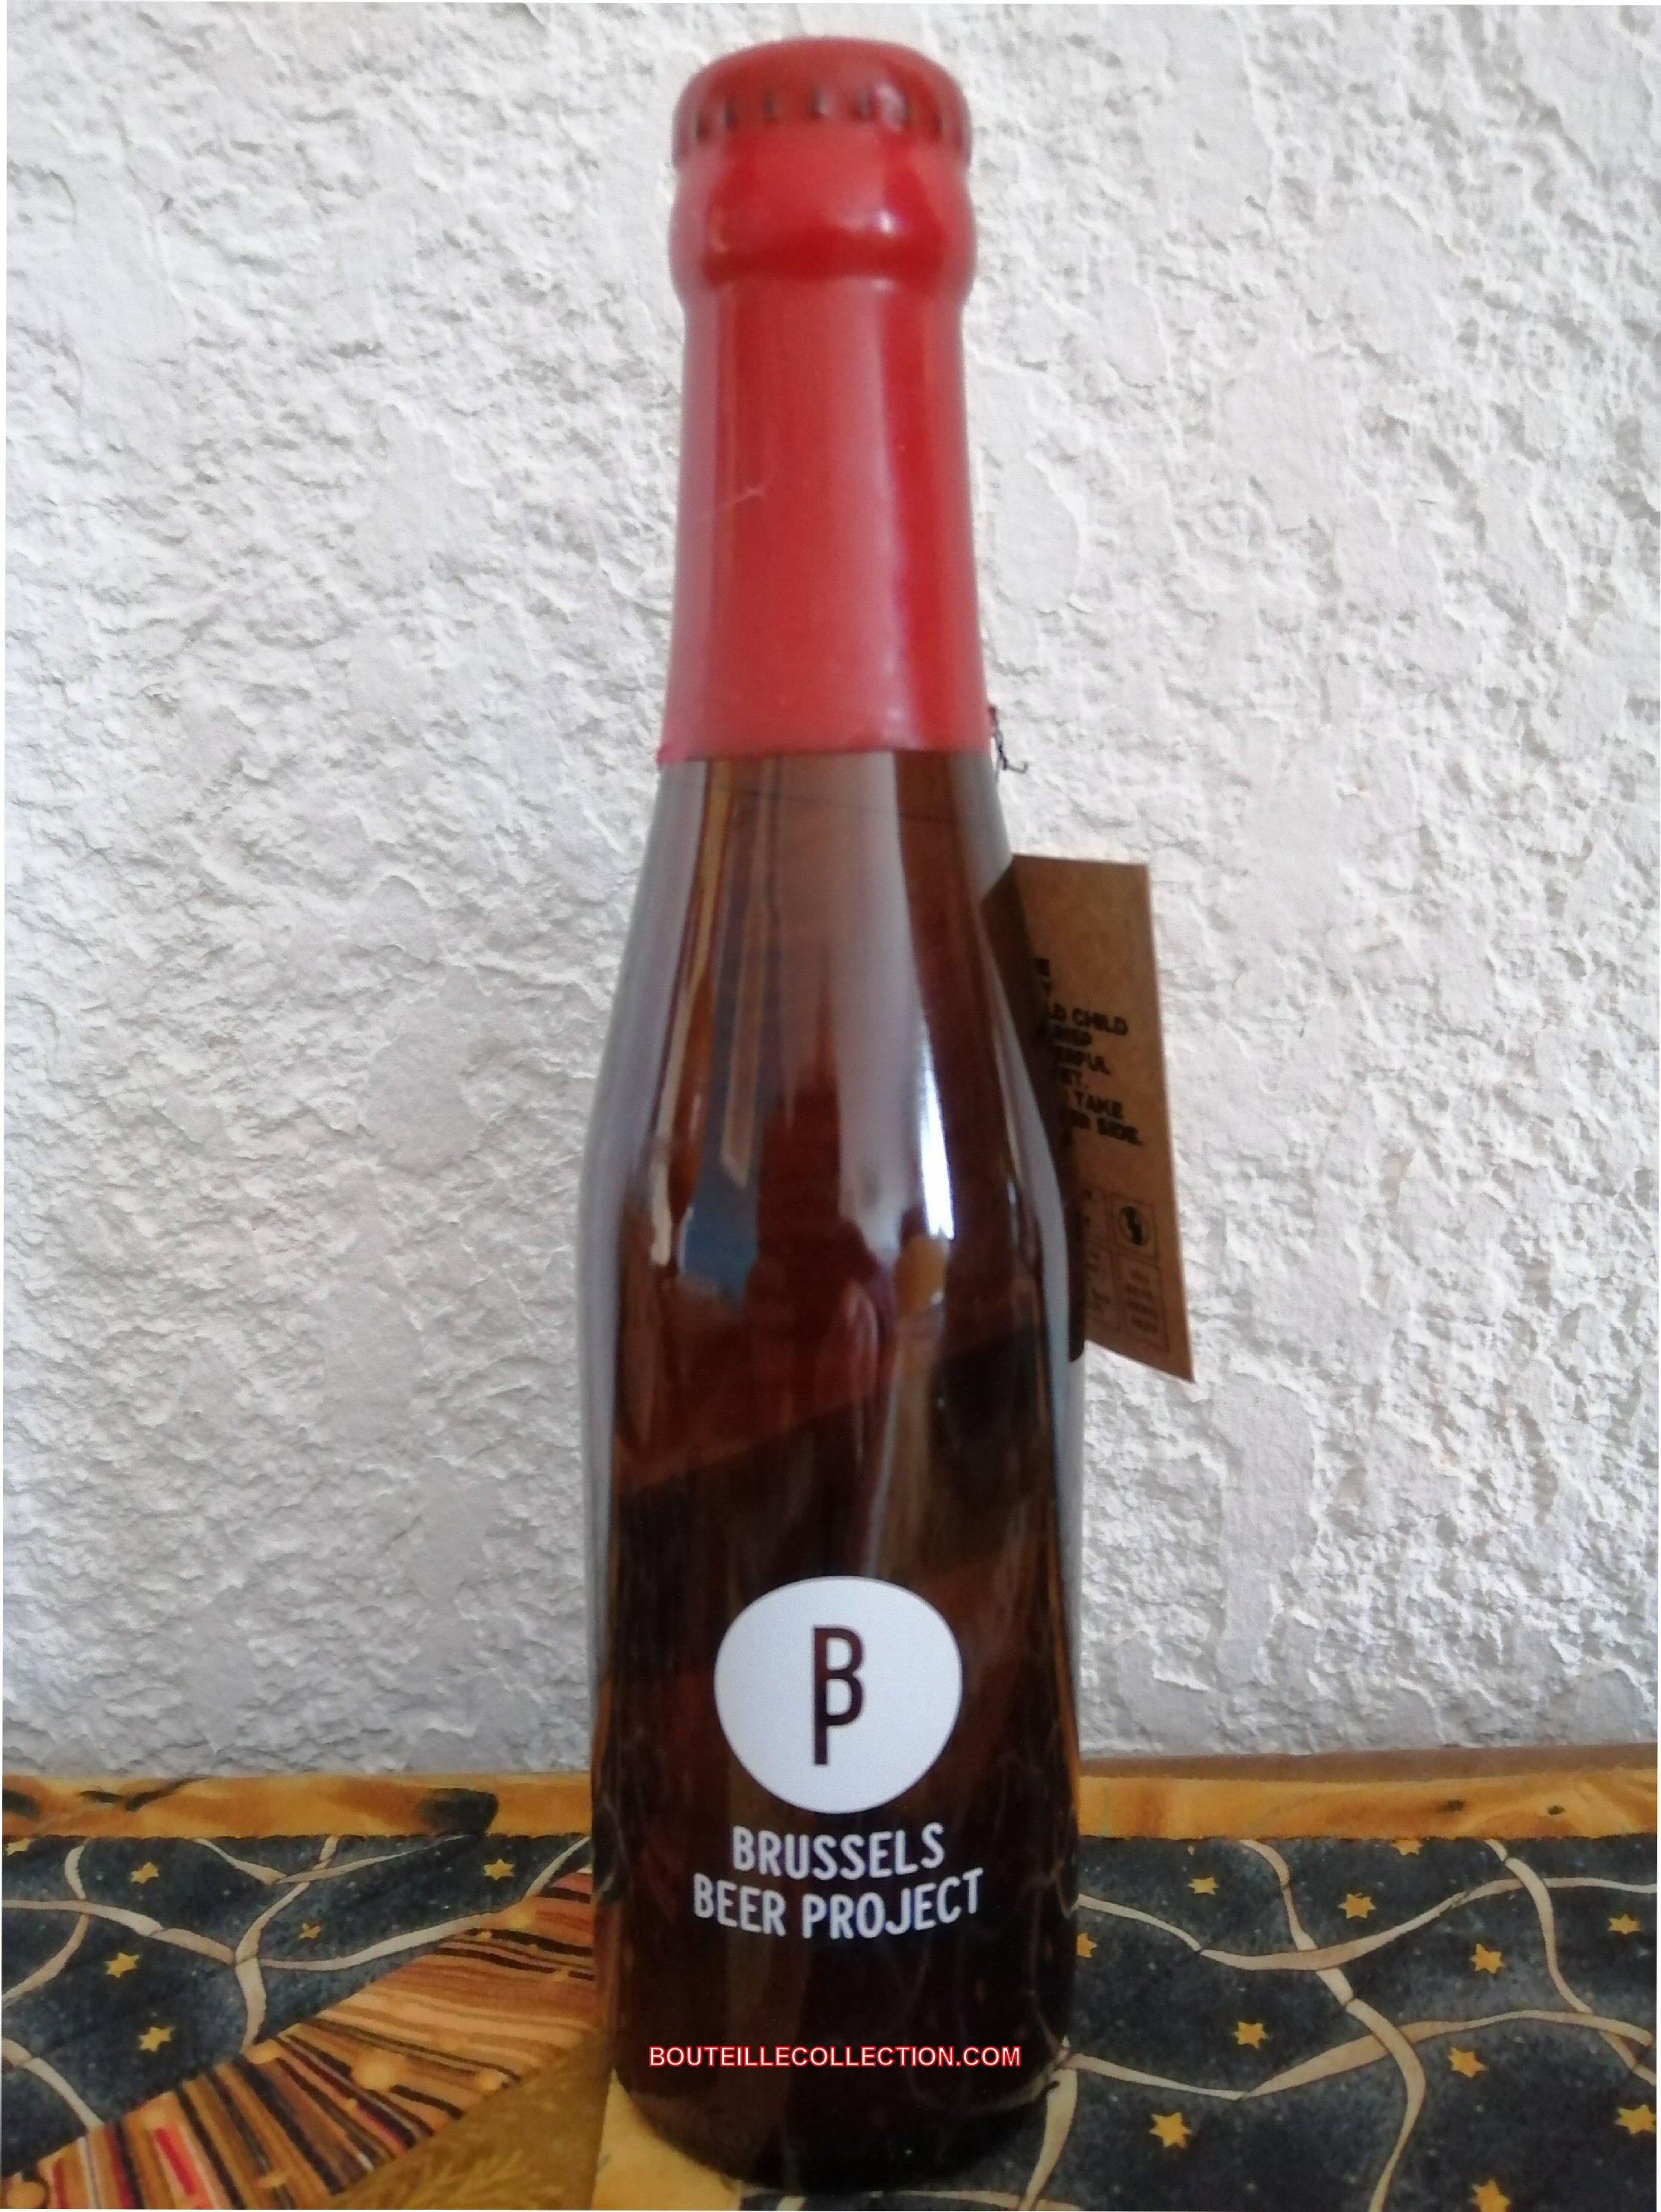 BRUSSELS BEER PROJECT WILDER CHILD 25CL B OK OK  .jpg